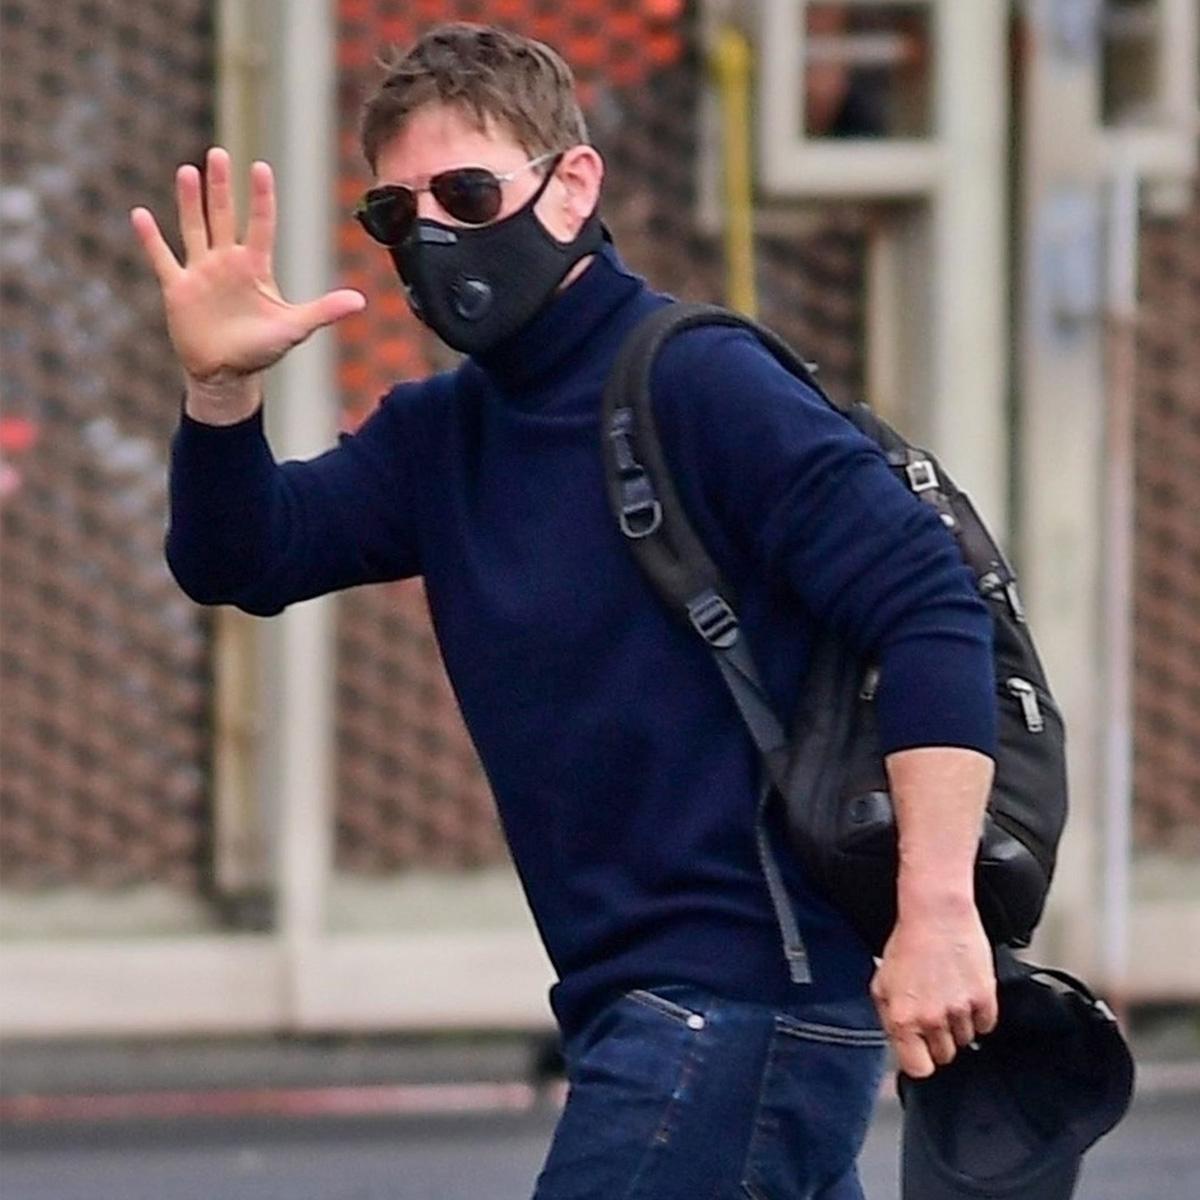 Tom Cruise Berates Mission: Impossible 7 Crew Over Coronavirus Protocols in Alleged Recording